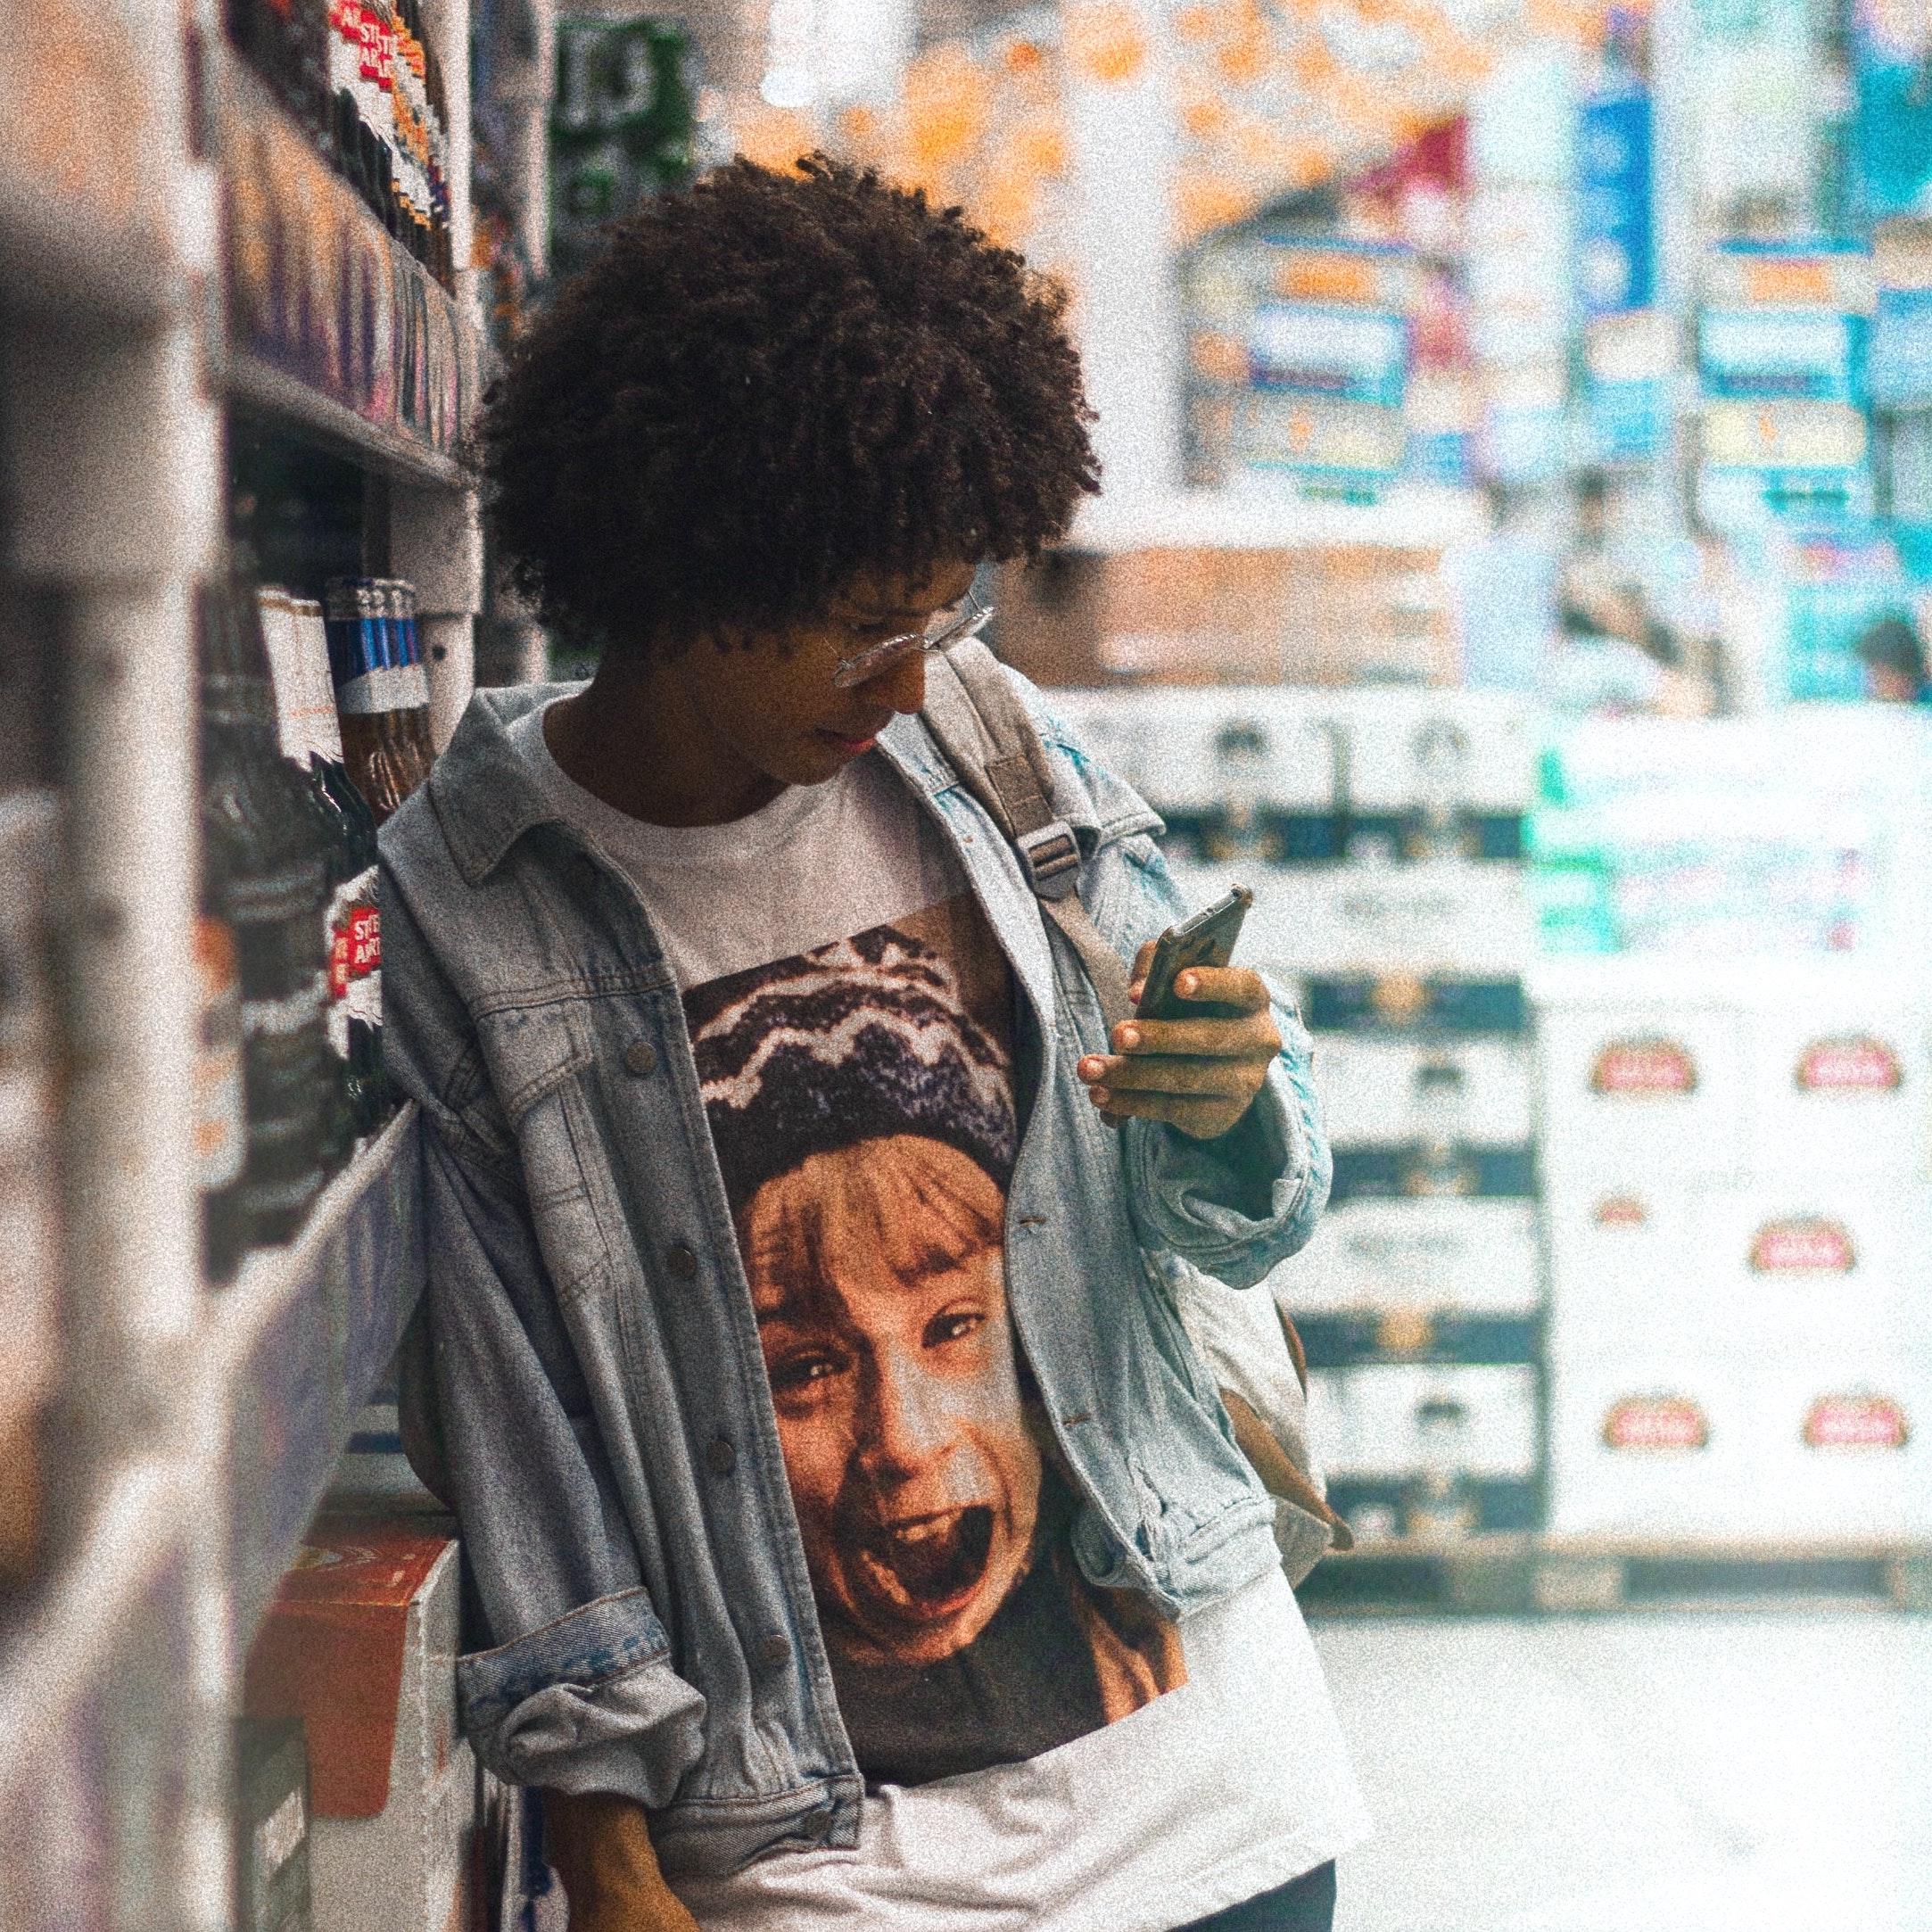 photo-of-woman-leaning-on-supermarket-hipoalergiczni-David-Gomes-pexels-com